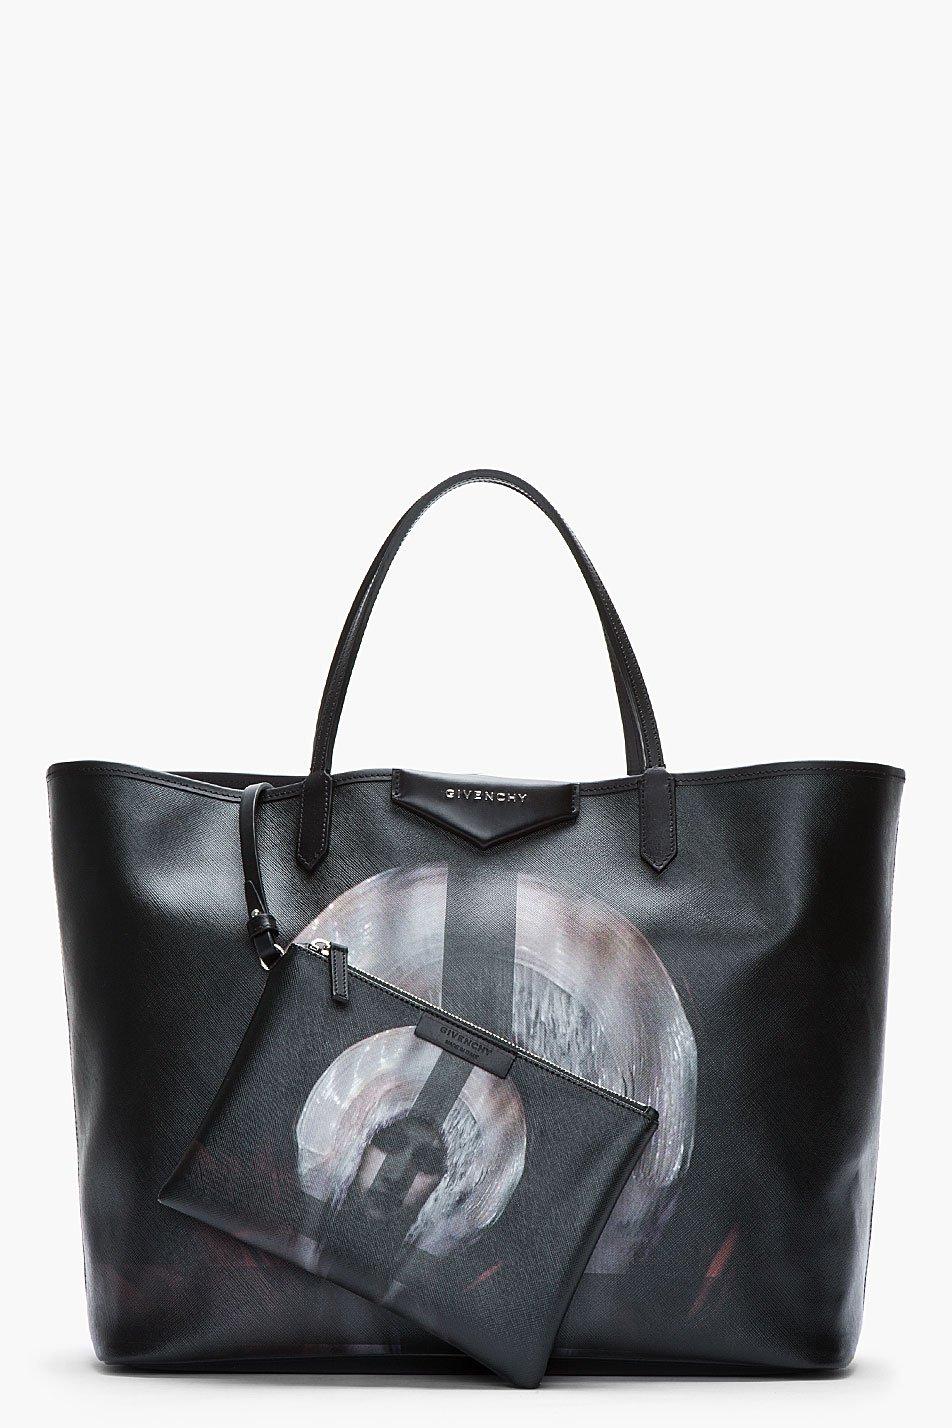 Lyst - Givenchy Large Black Pvc Madonna Printed Antigona Shopper ... 8112a8439a930